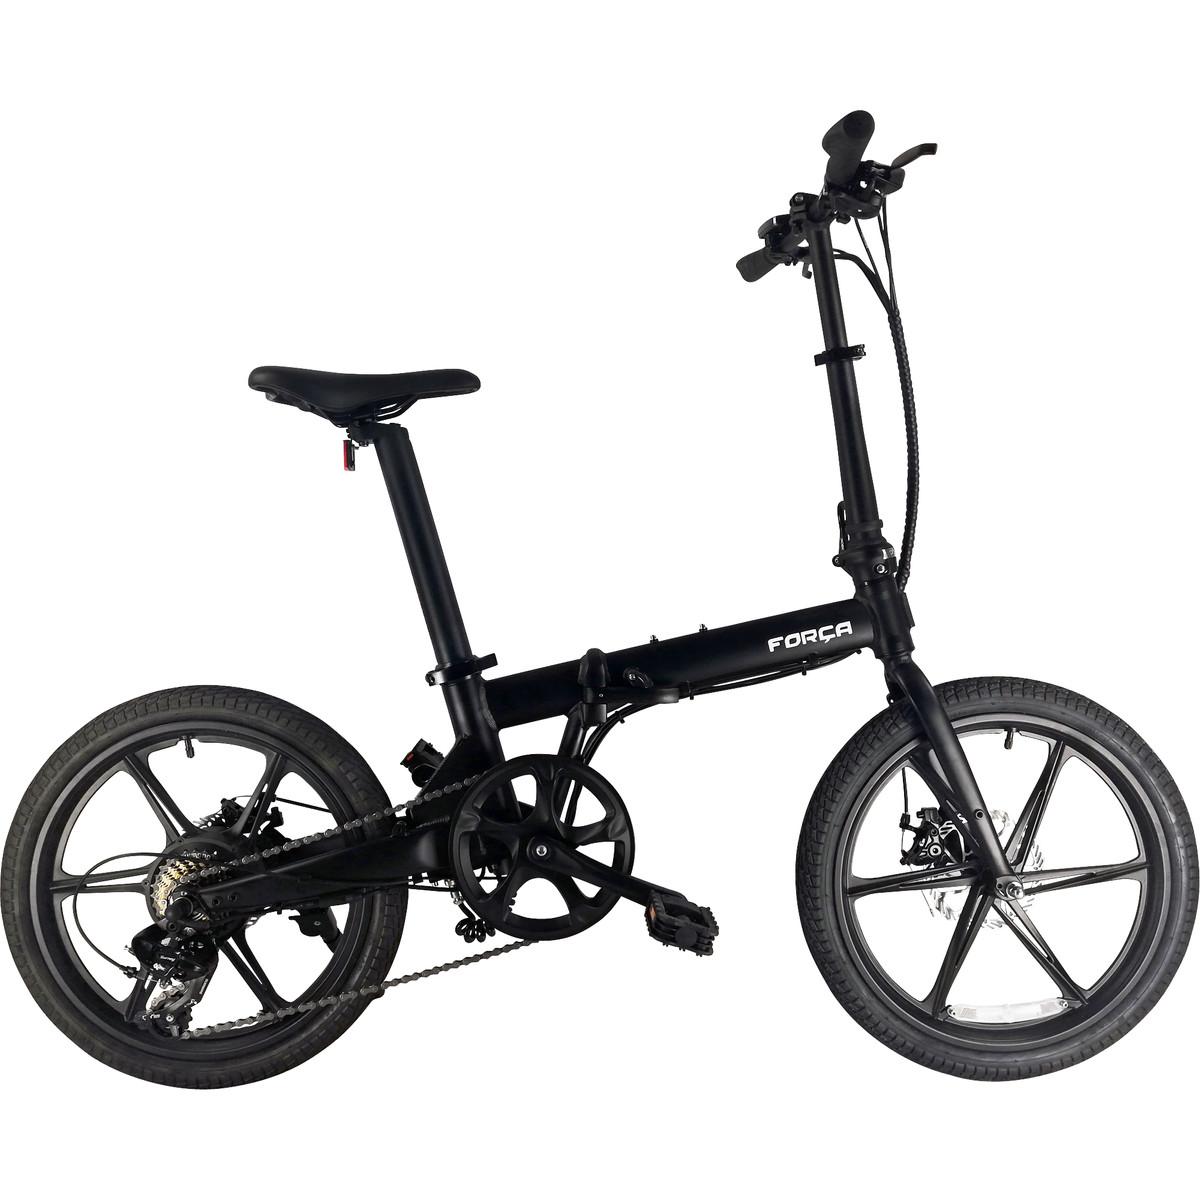 "FORÇA E-Bike FOLIBIKE 20"" Faltfahrrad EBike Grey"